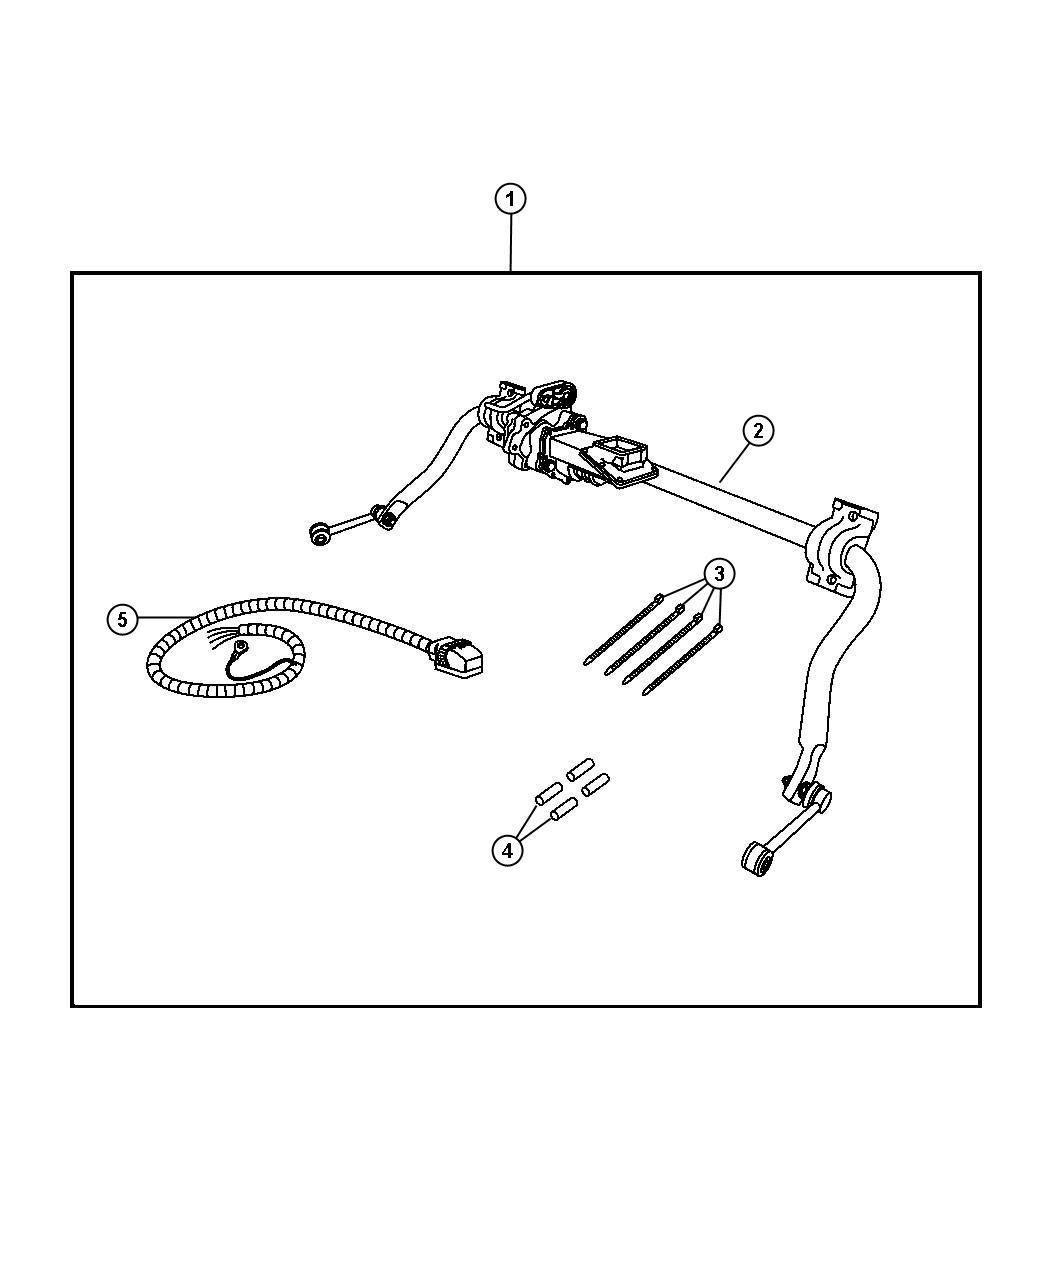 2009 Jeep Wrangler Bar kit. Stabilizer. Electronic, road